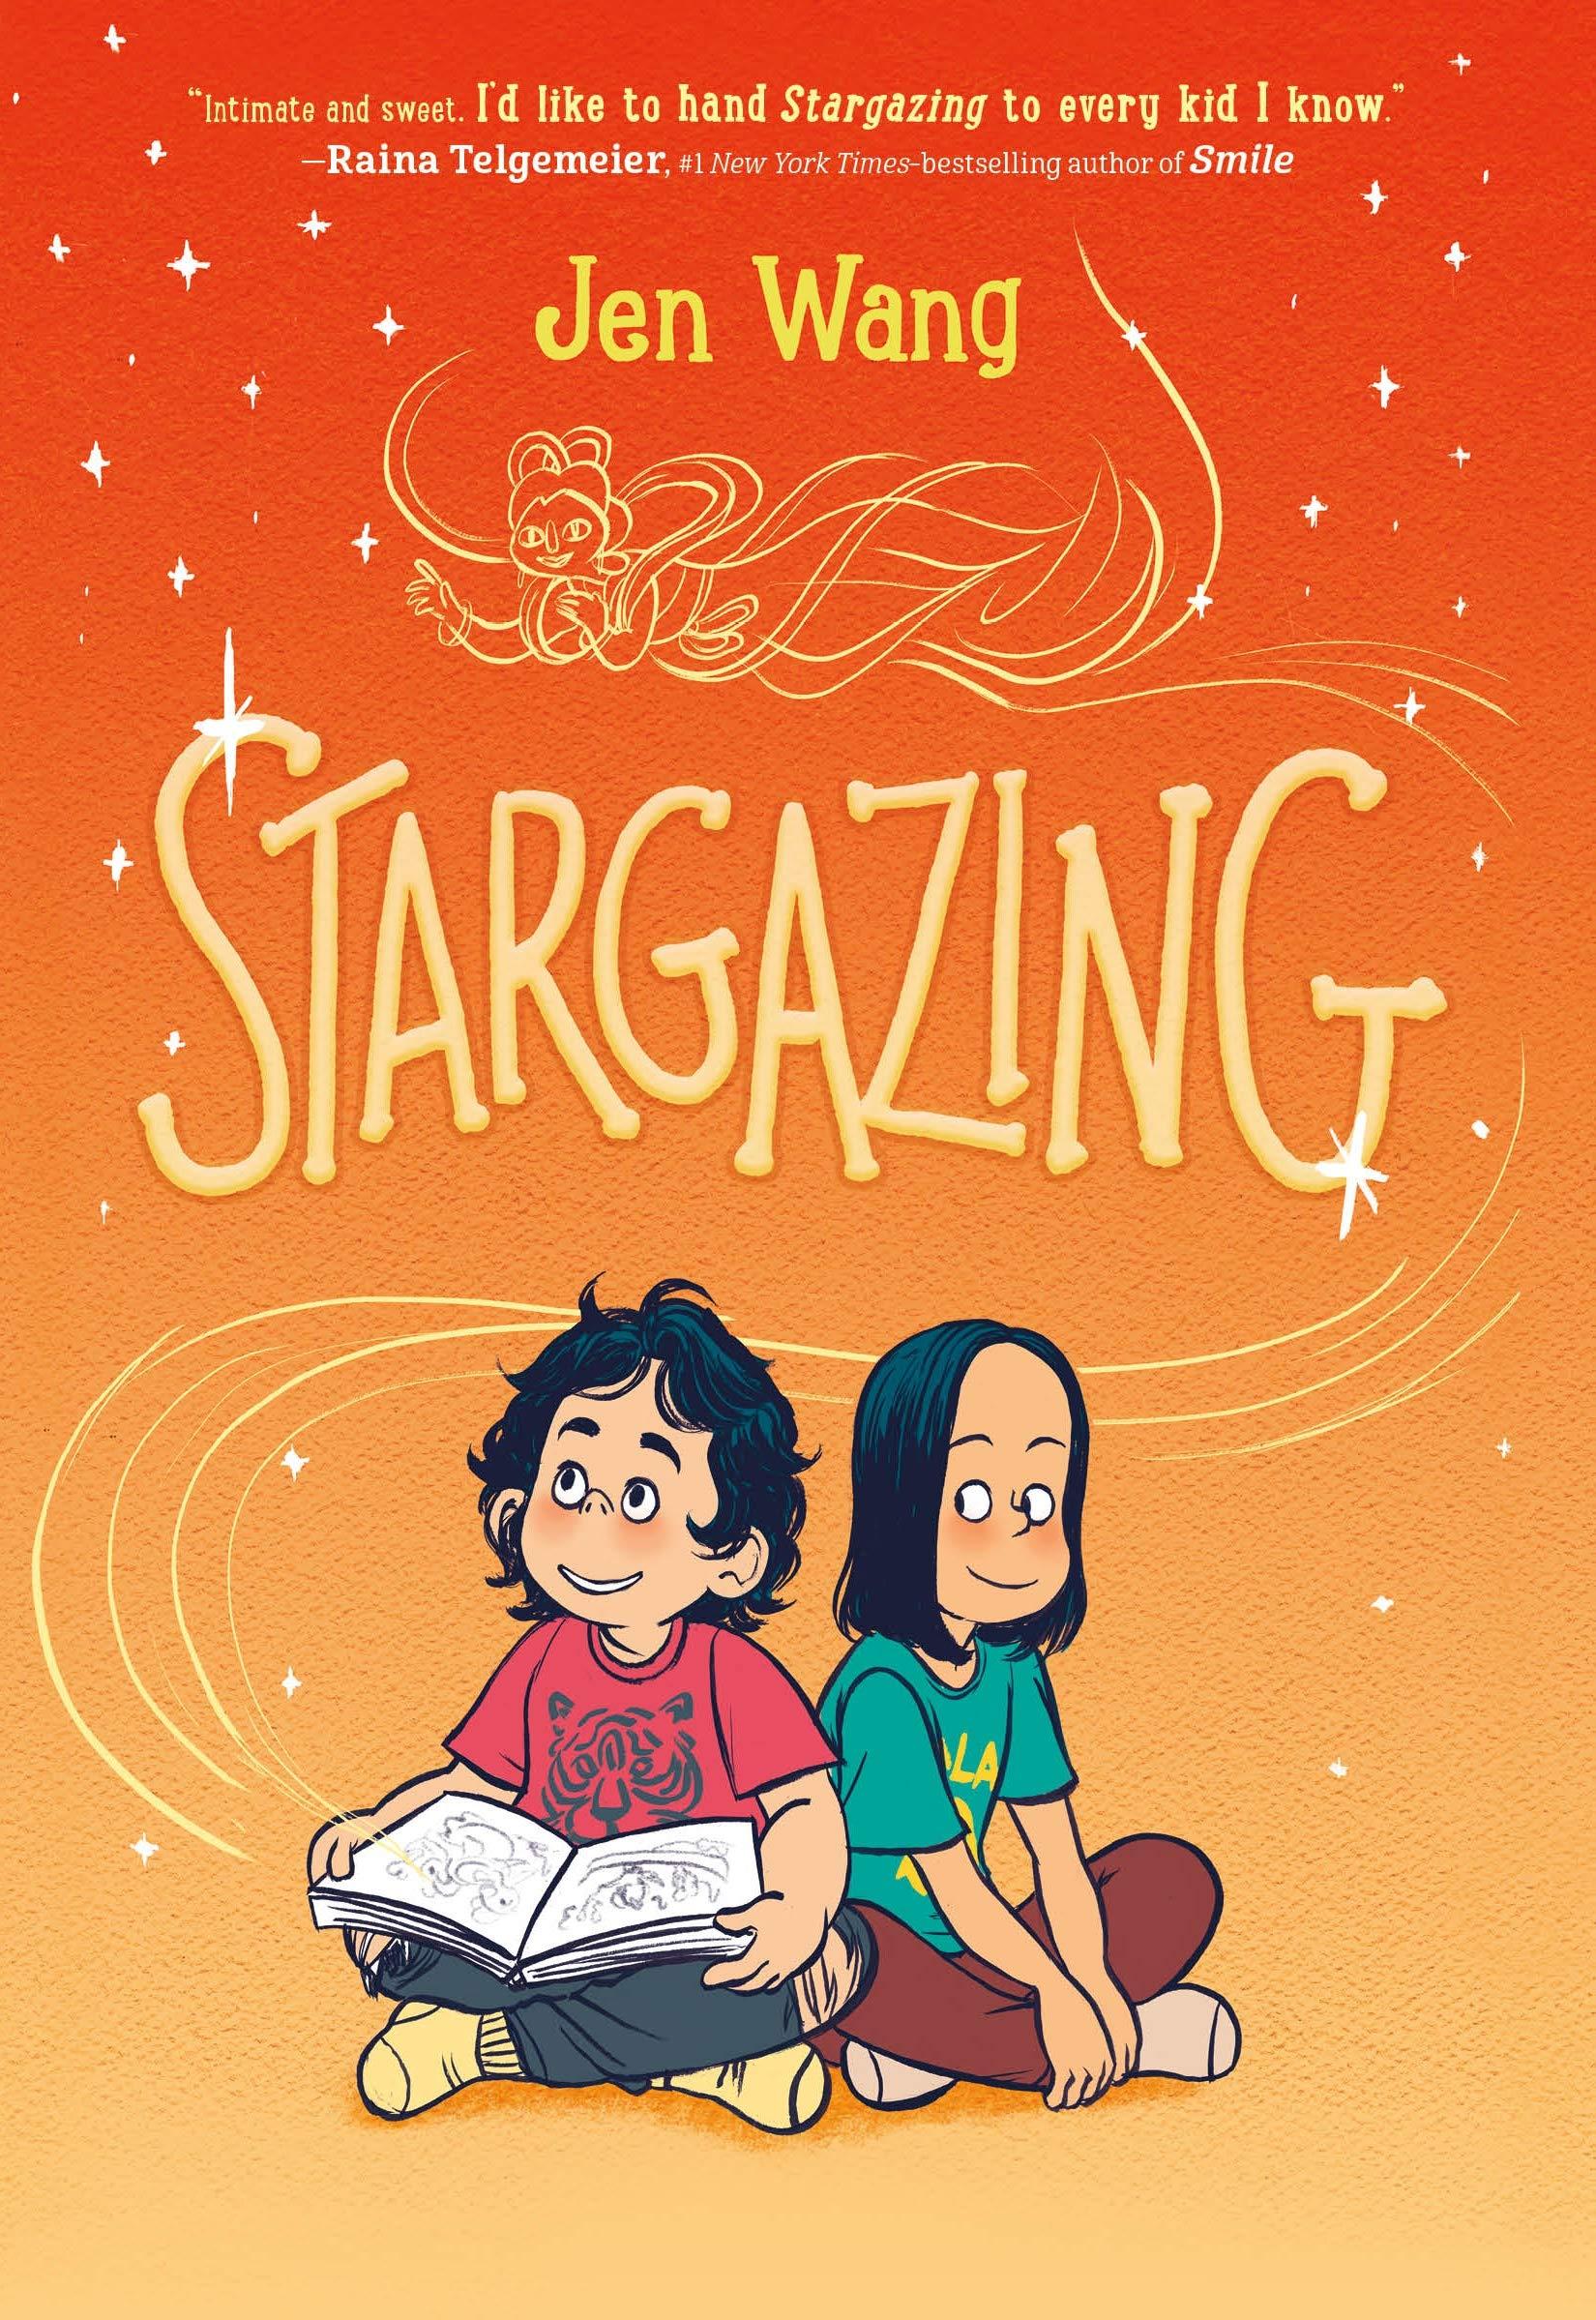 Best Comics of 2019: Stargazing